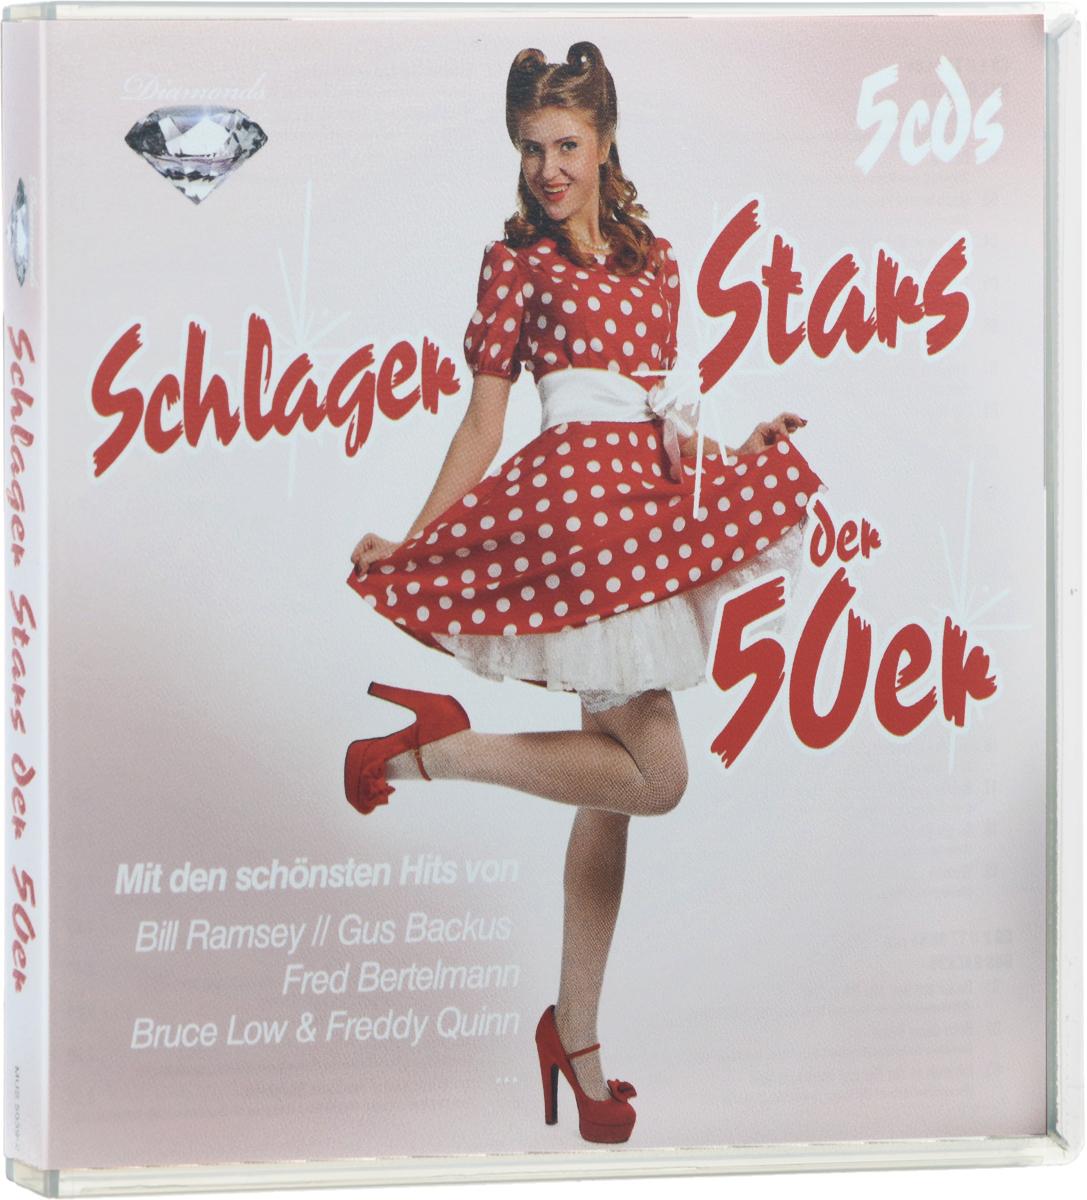 Билл Рэмси,Гус Бэкус,Фред Бертельман,Брюс Лоу,Фредди Куинн Diamonds. Schlager Stars Der 50er (5 CD) цена